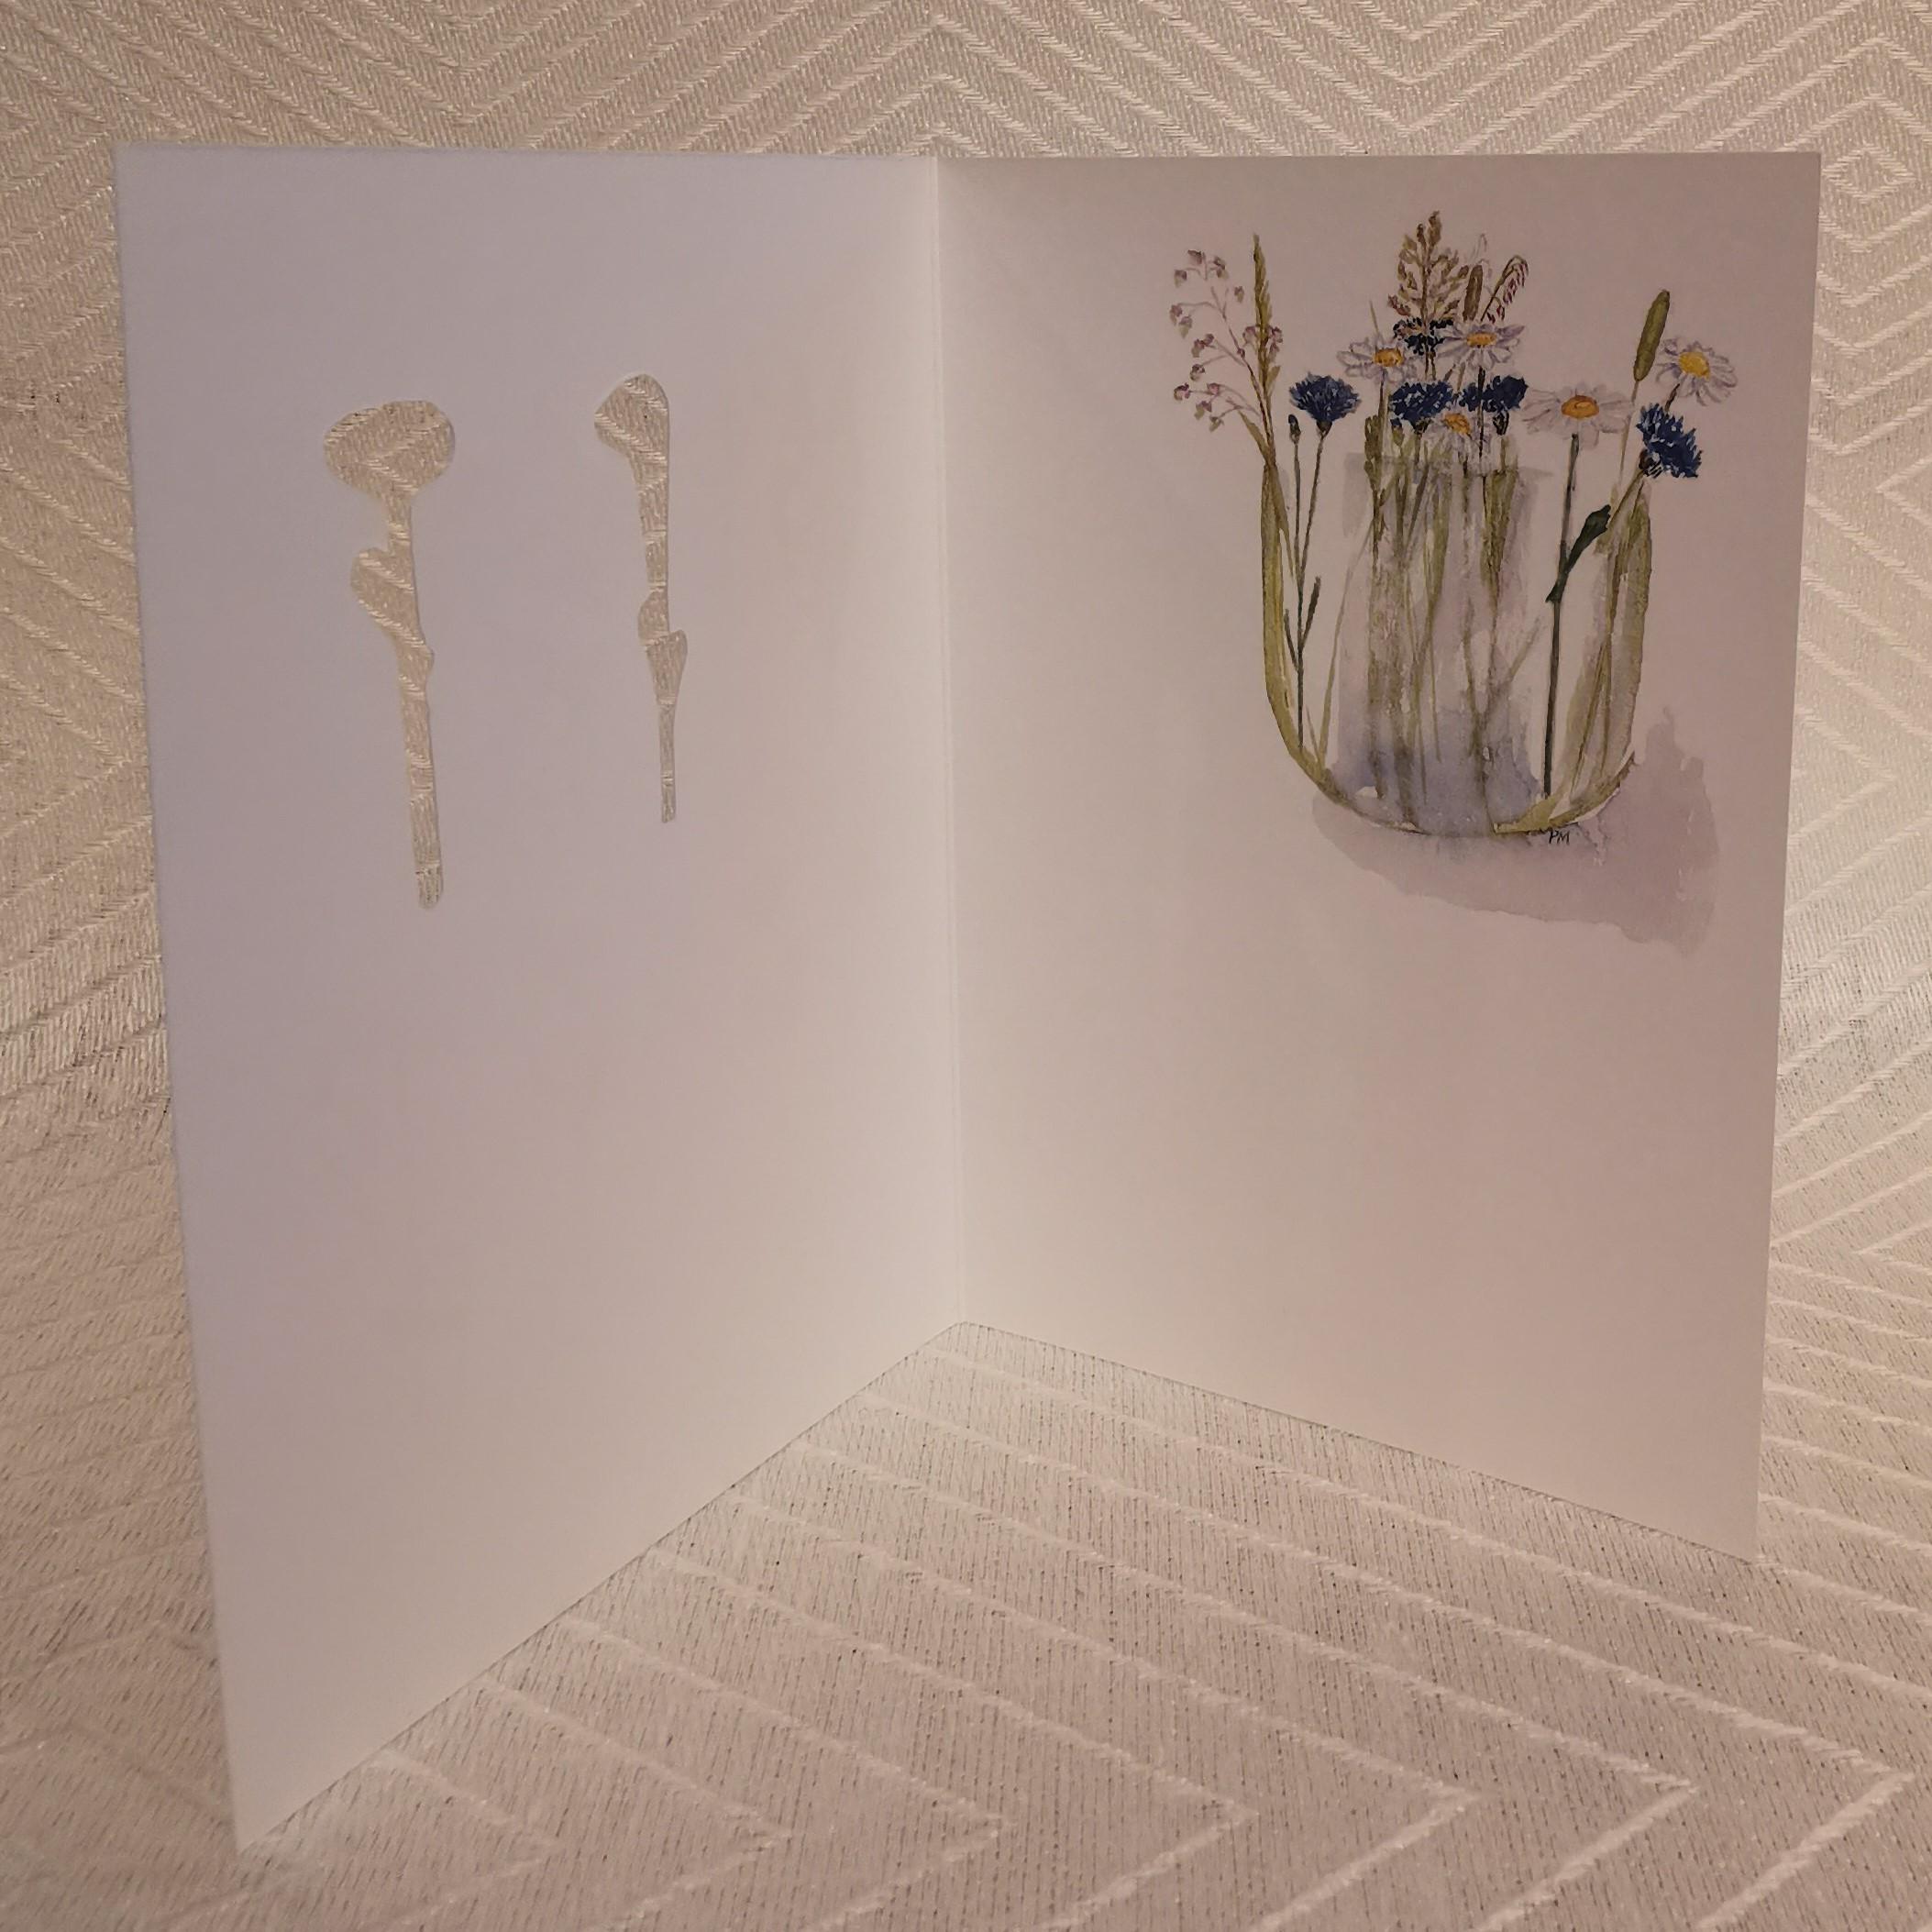 Vikt kort i akvarell med surprise blommor på rad insidan